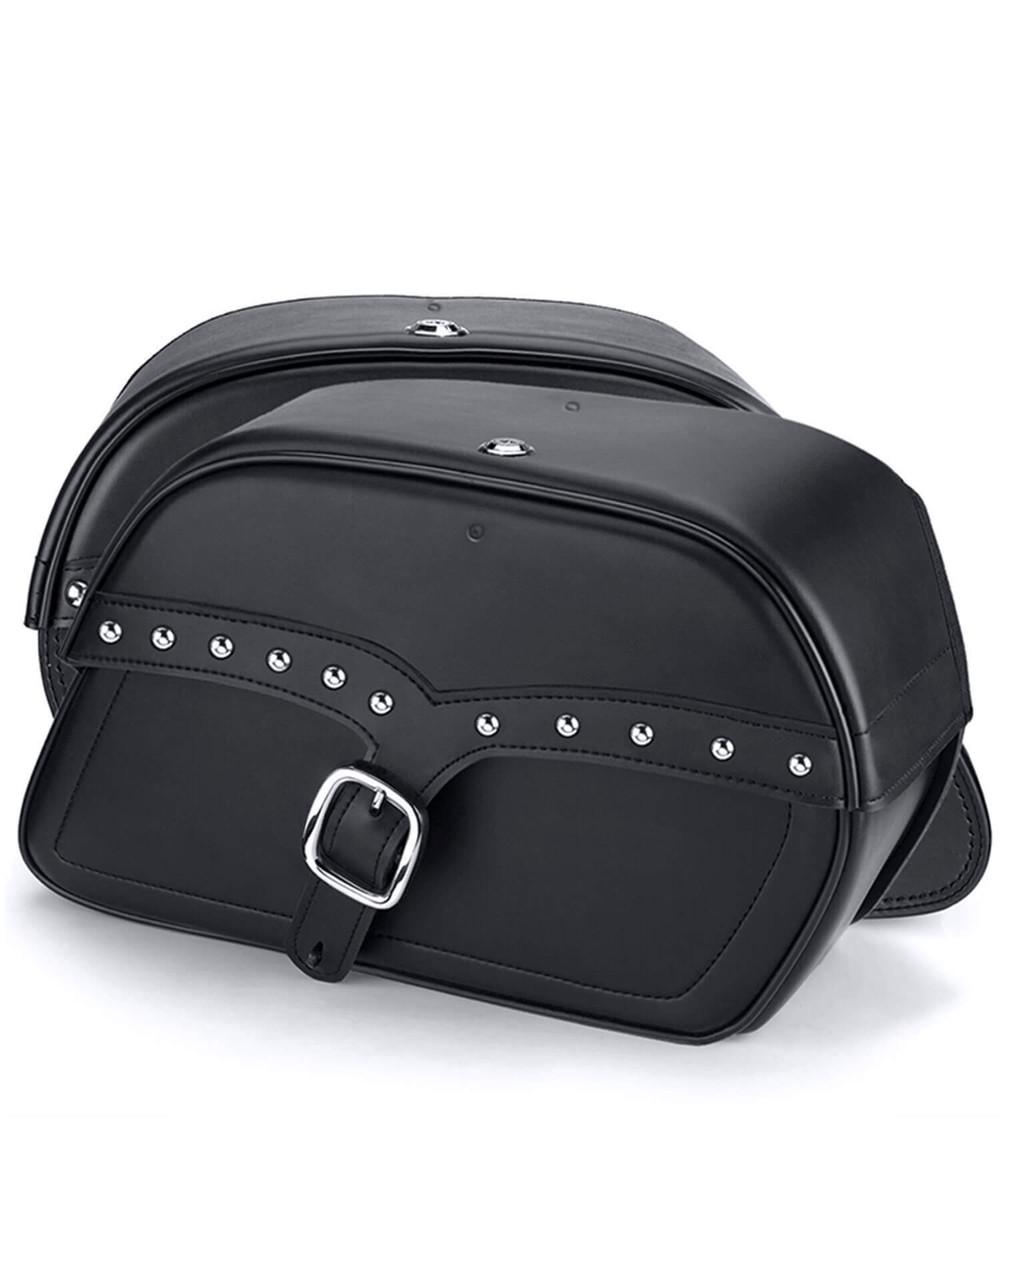 Kawasaki Eliminator 125 Charger Single Strap Studded Medium Motorcycle Saddlebags  Both Bags View